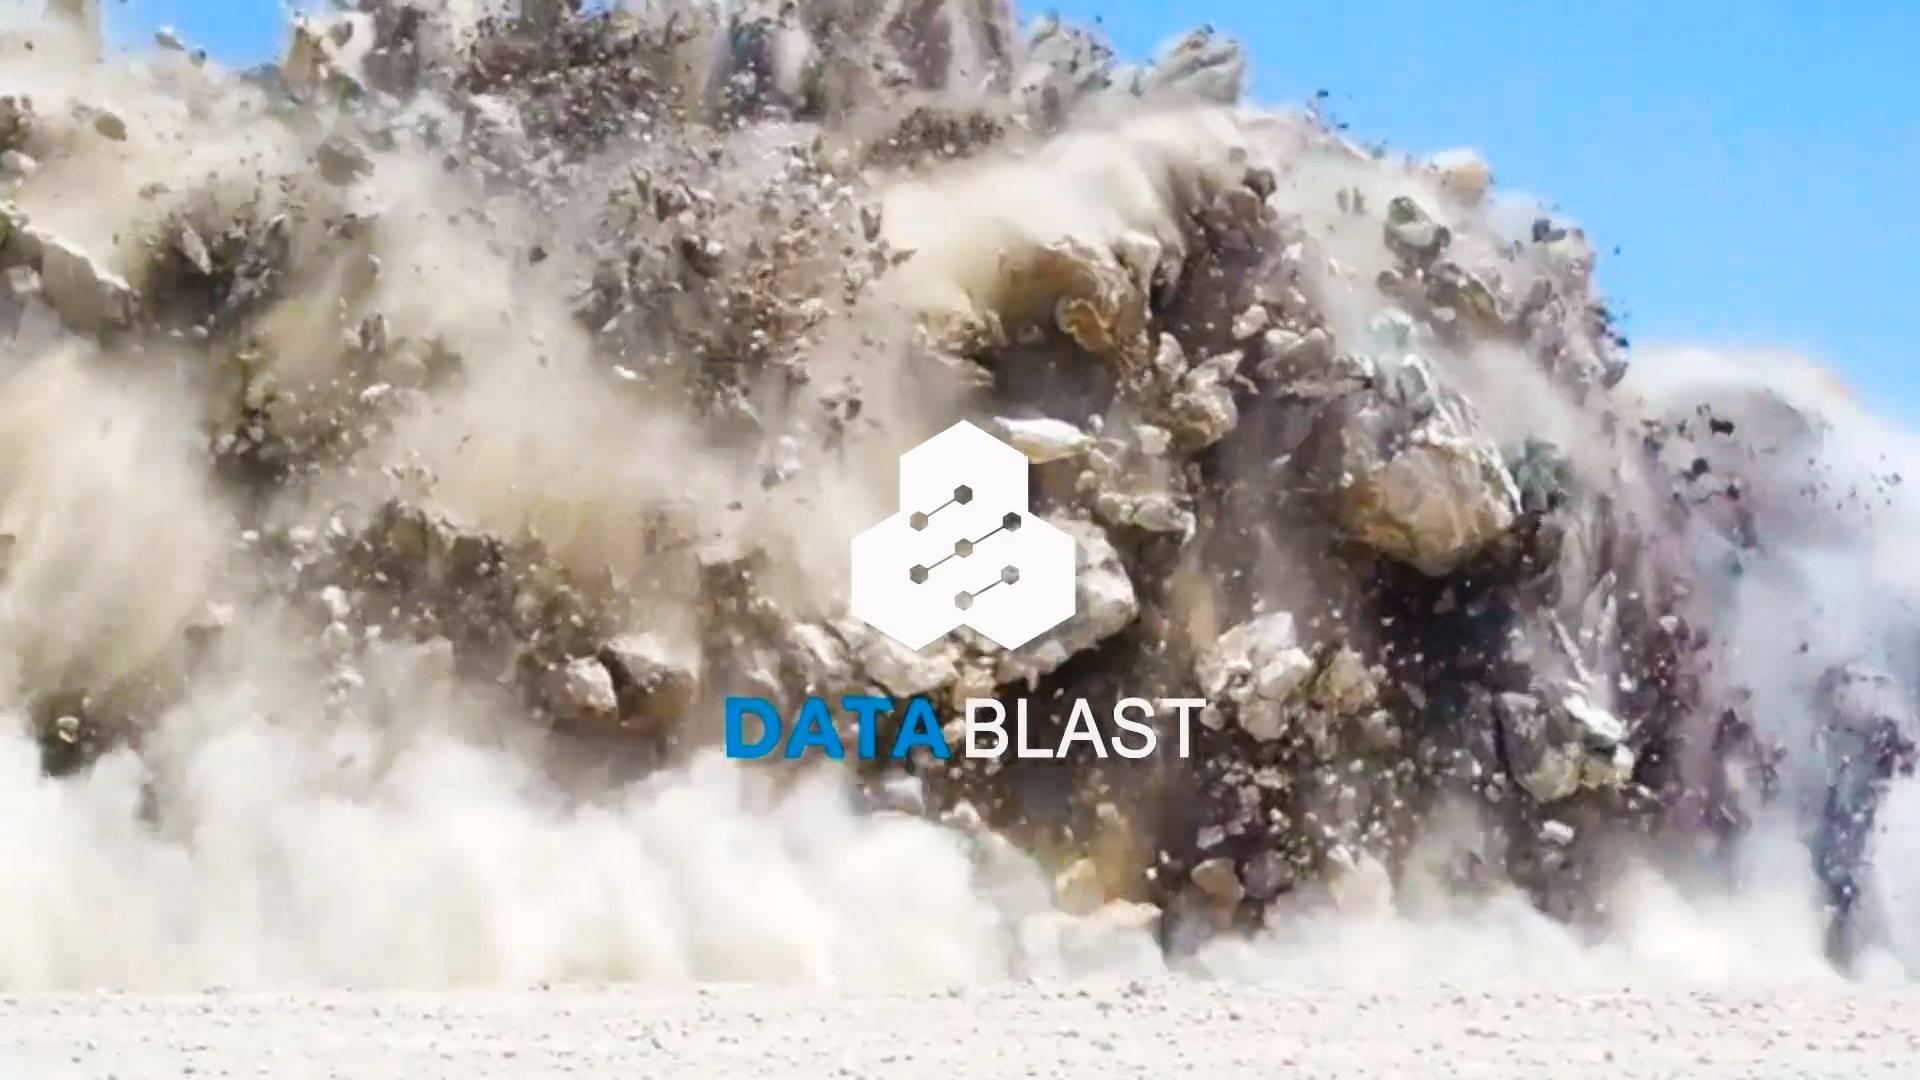 DataBlast-Overview-Video-Screenshot-1